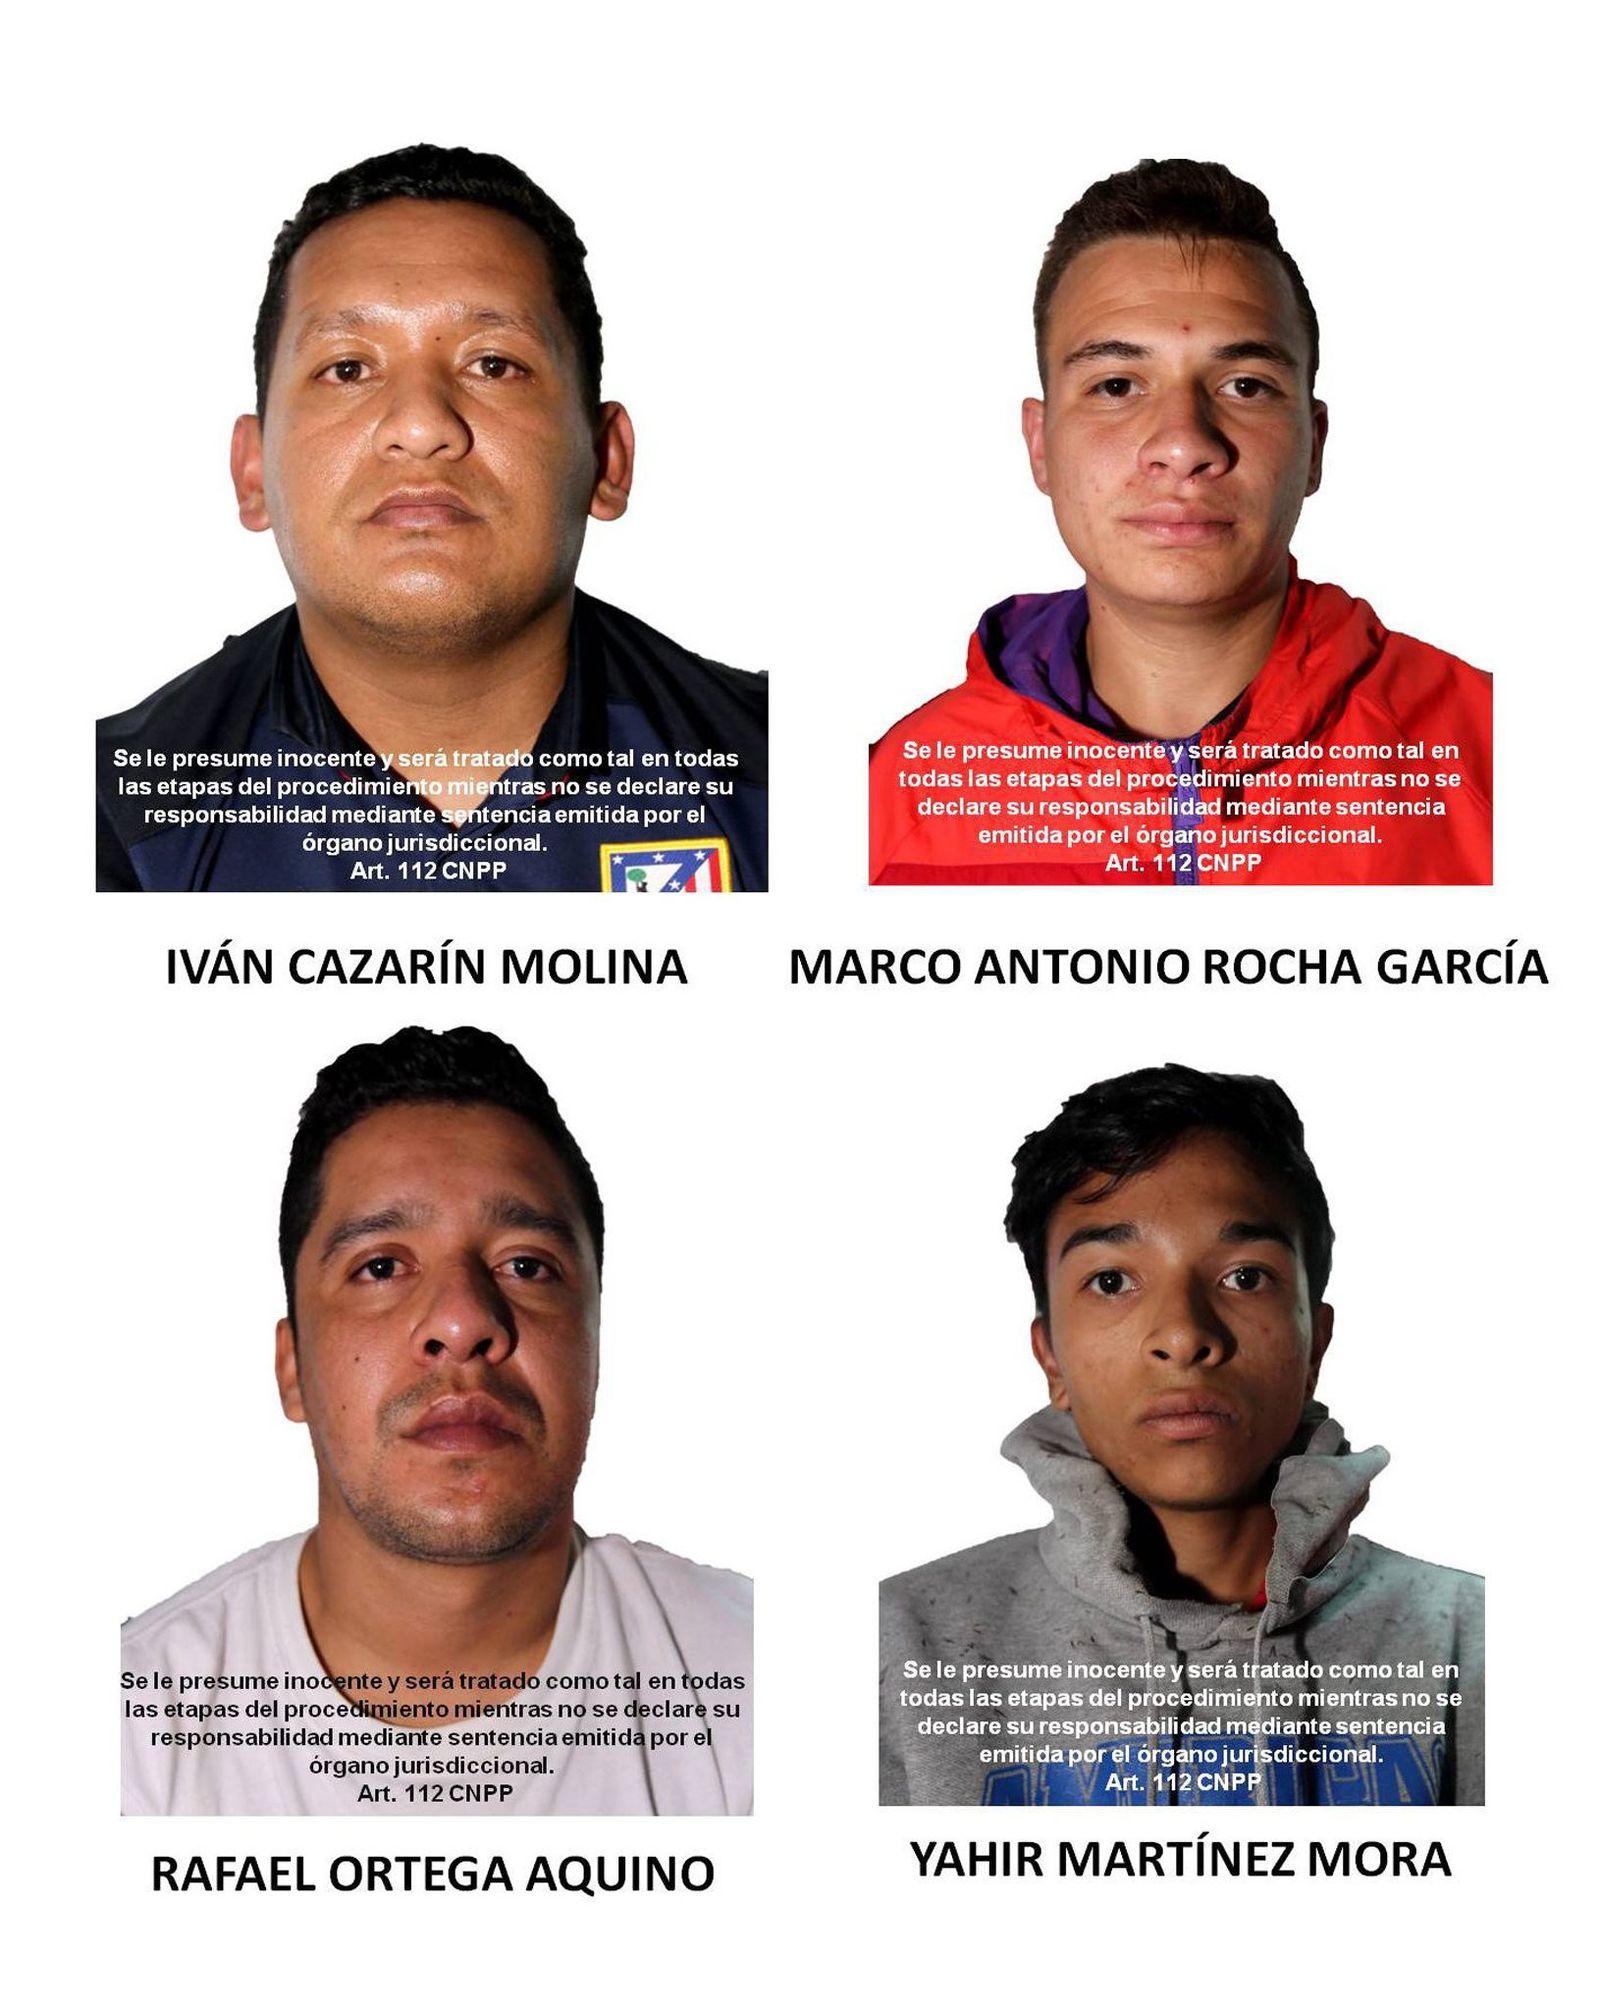 Mexiko/ Ivan Cazarin Molina/ Drogenkrieg